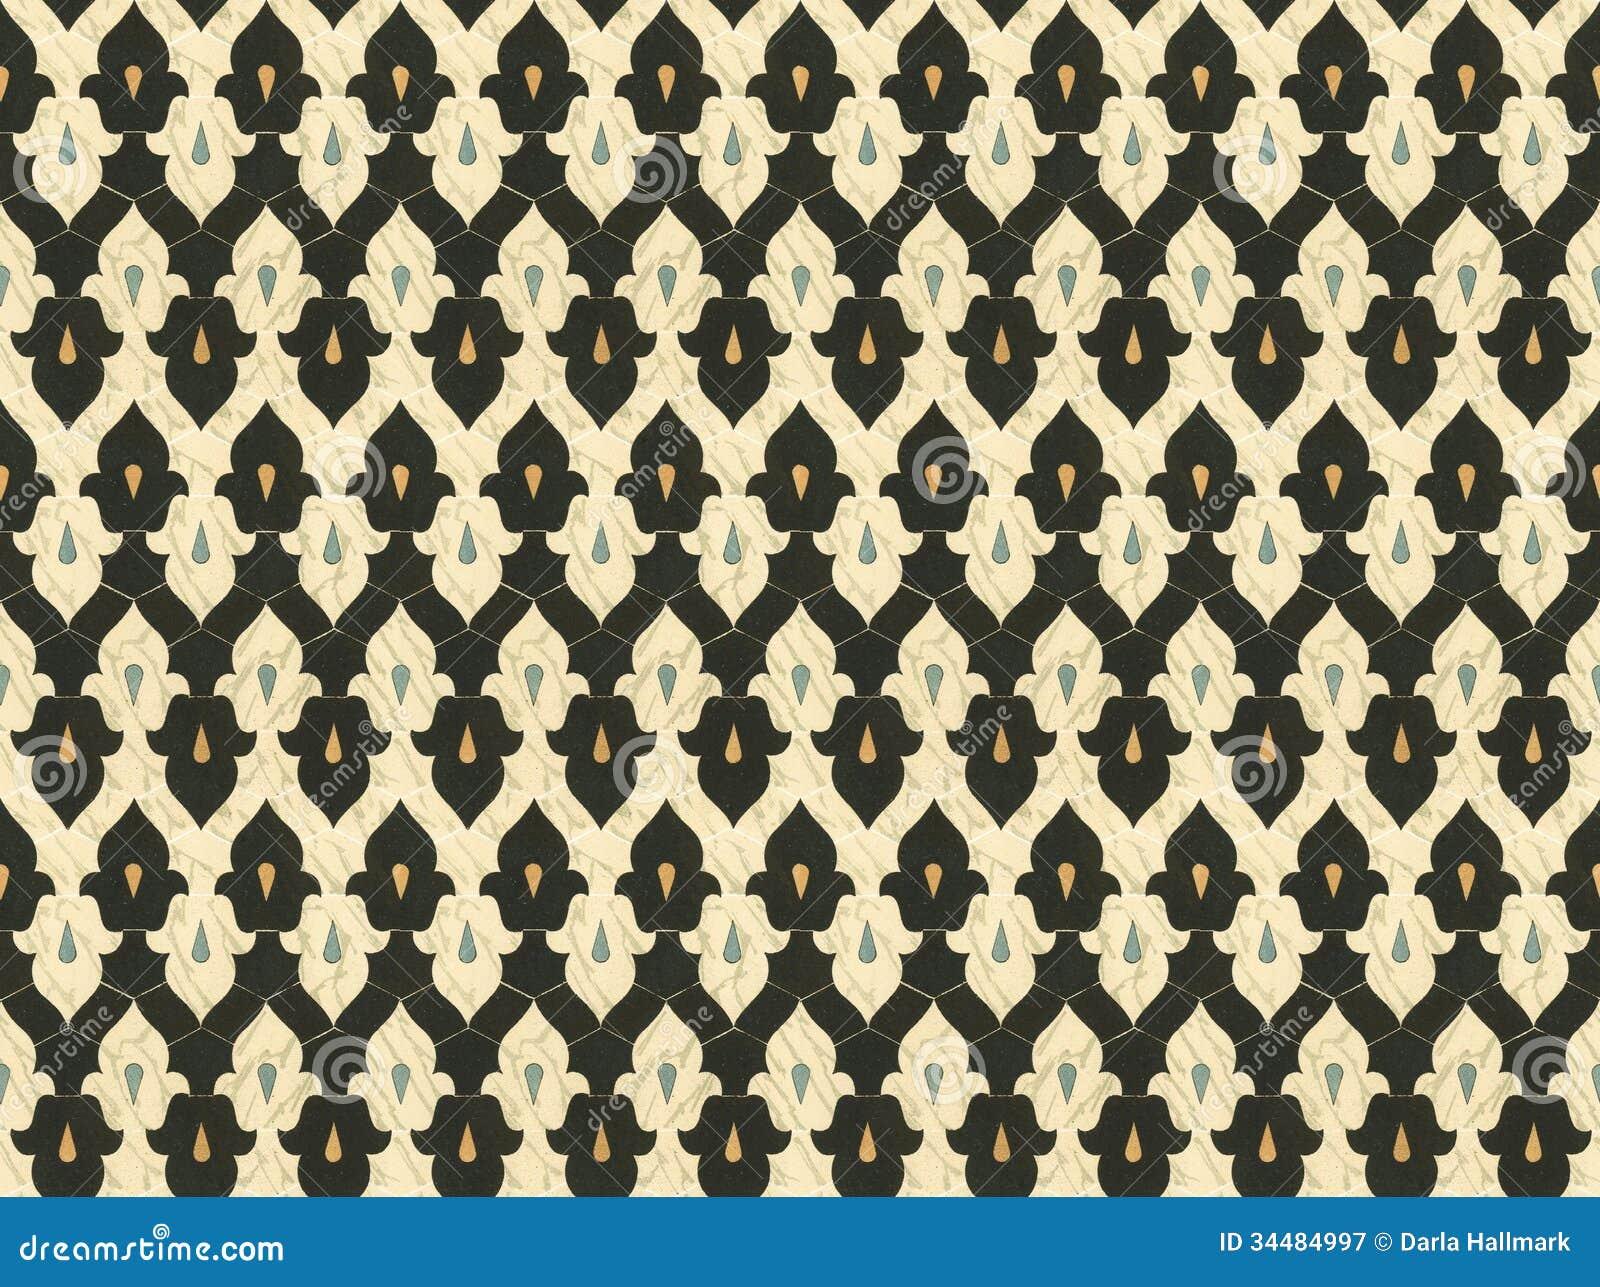 Persian tiles stock illustration illustration of islamic 34484997 persian tiles dailygadgetfo Choice Image